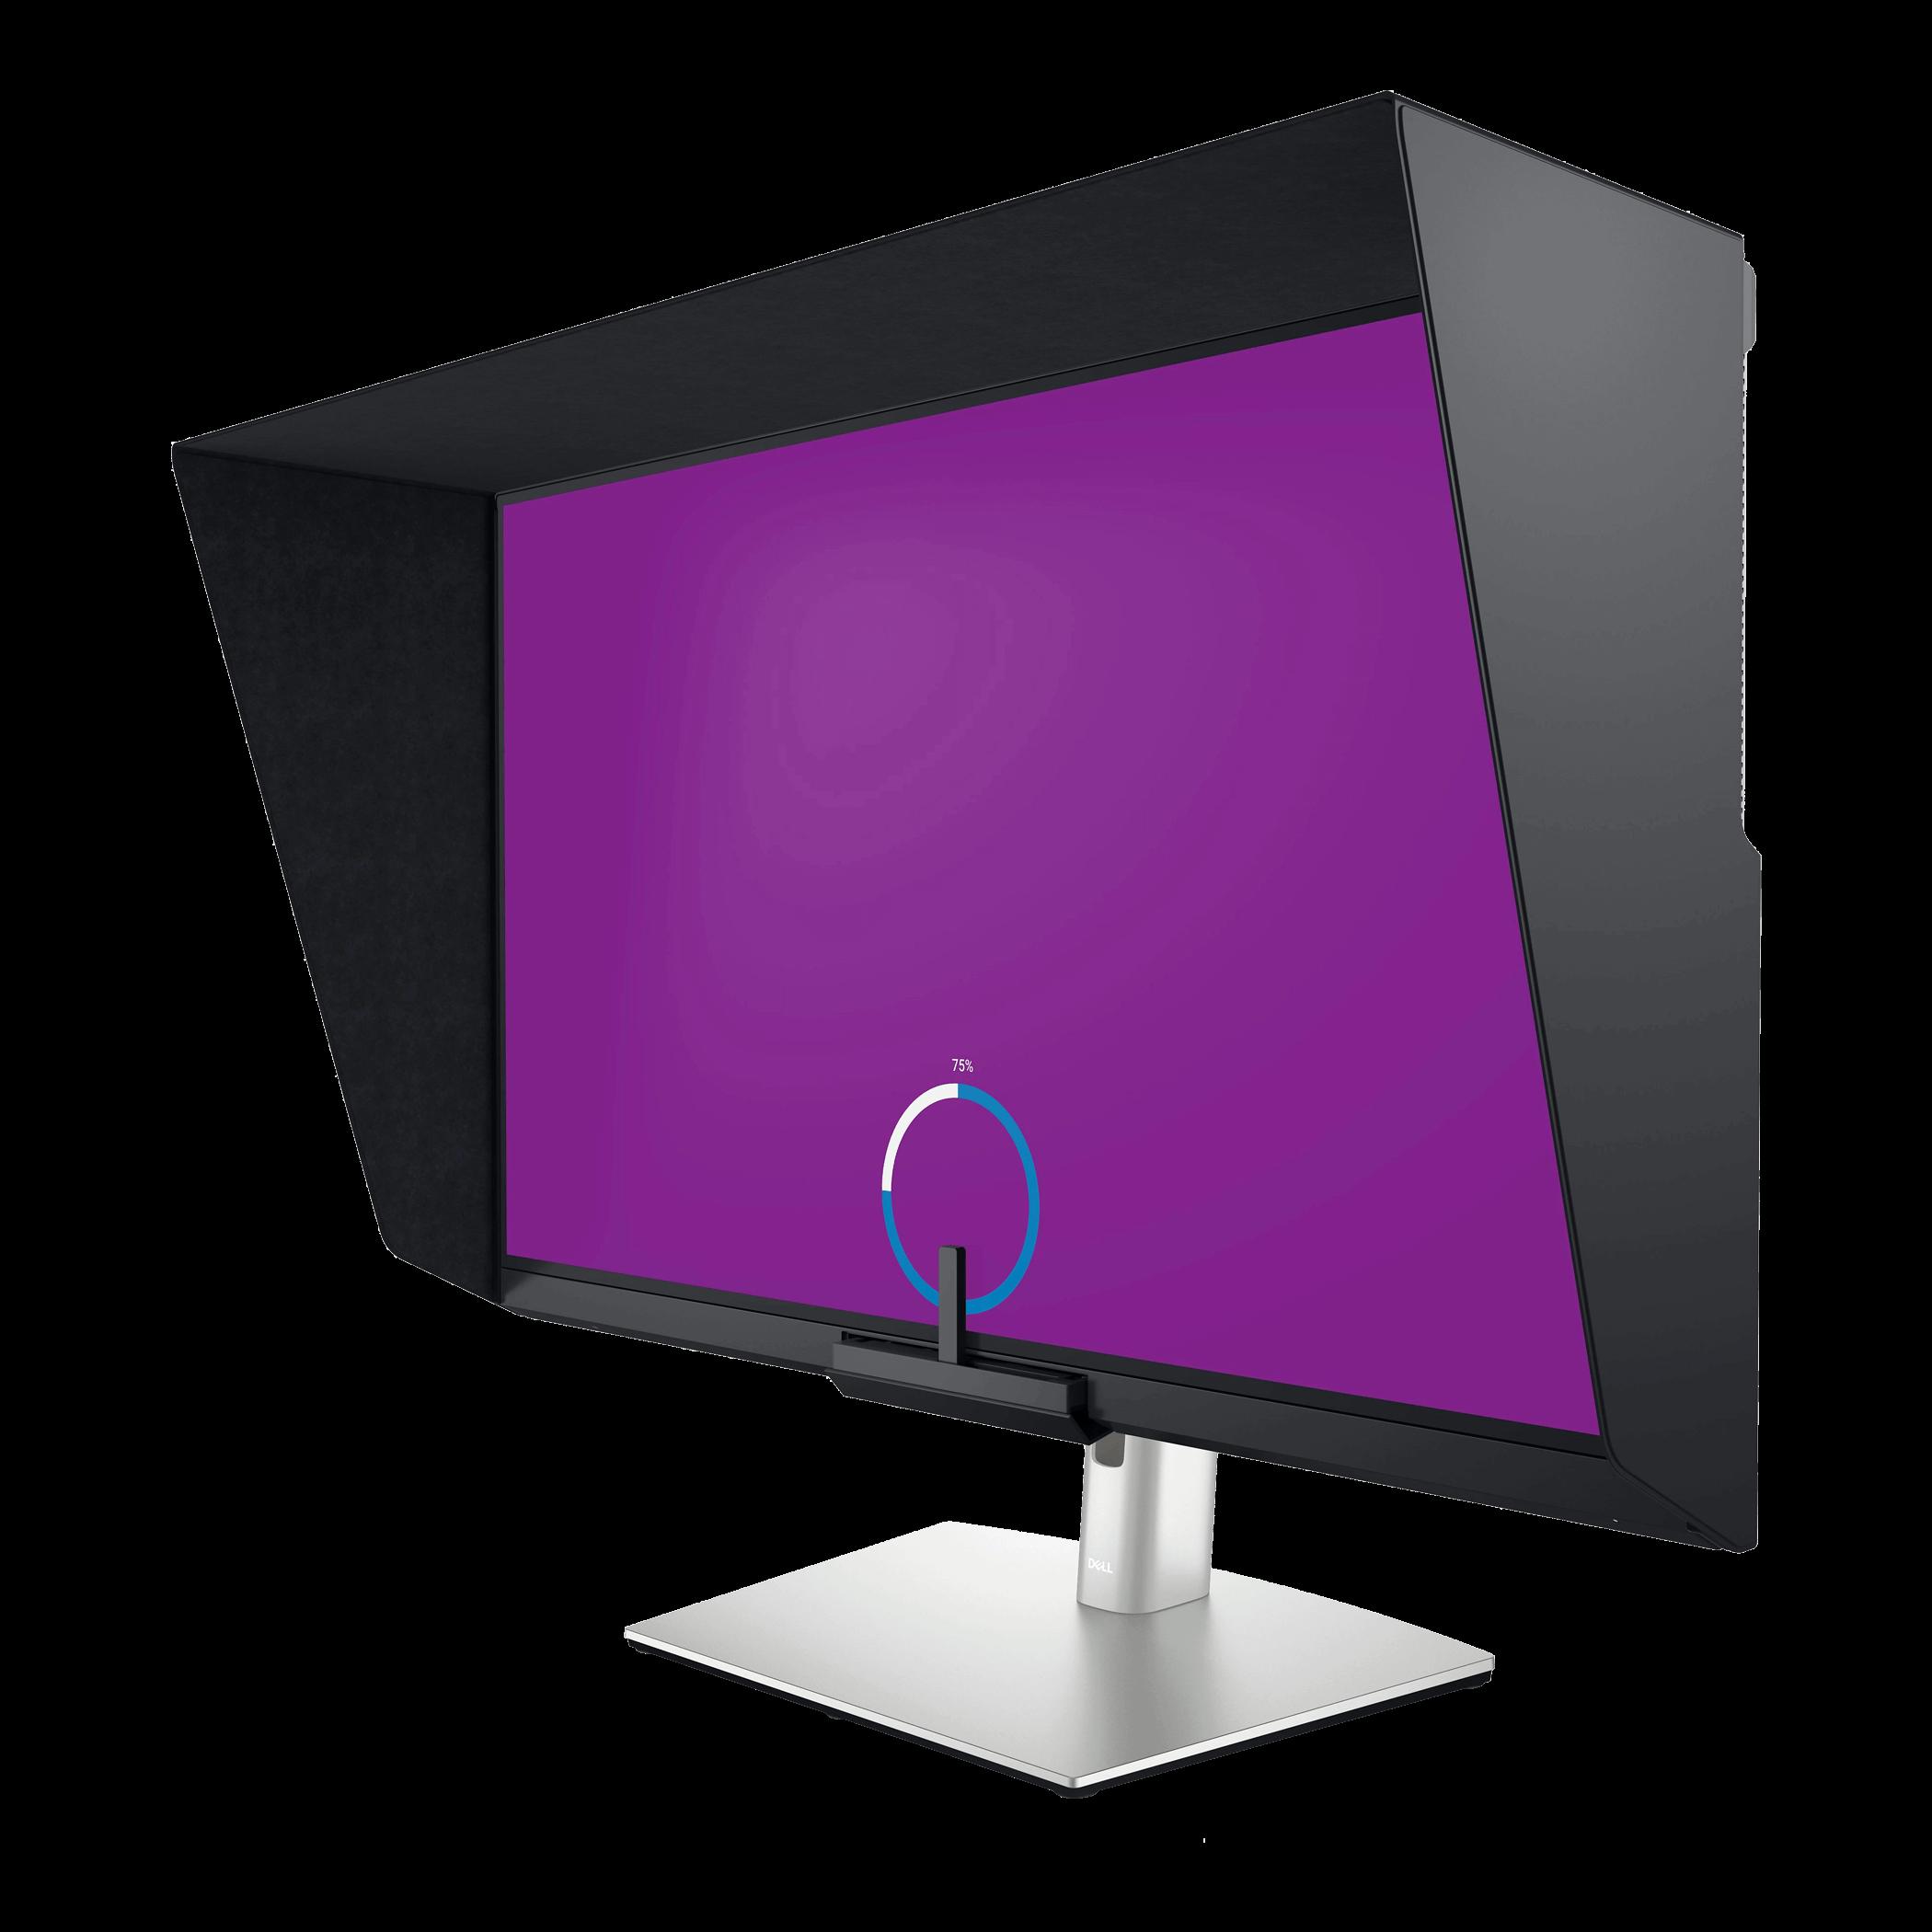 Dell-UltraSharp-UP3221Q-Produkttext-Bild02